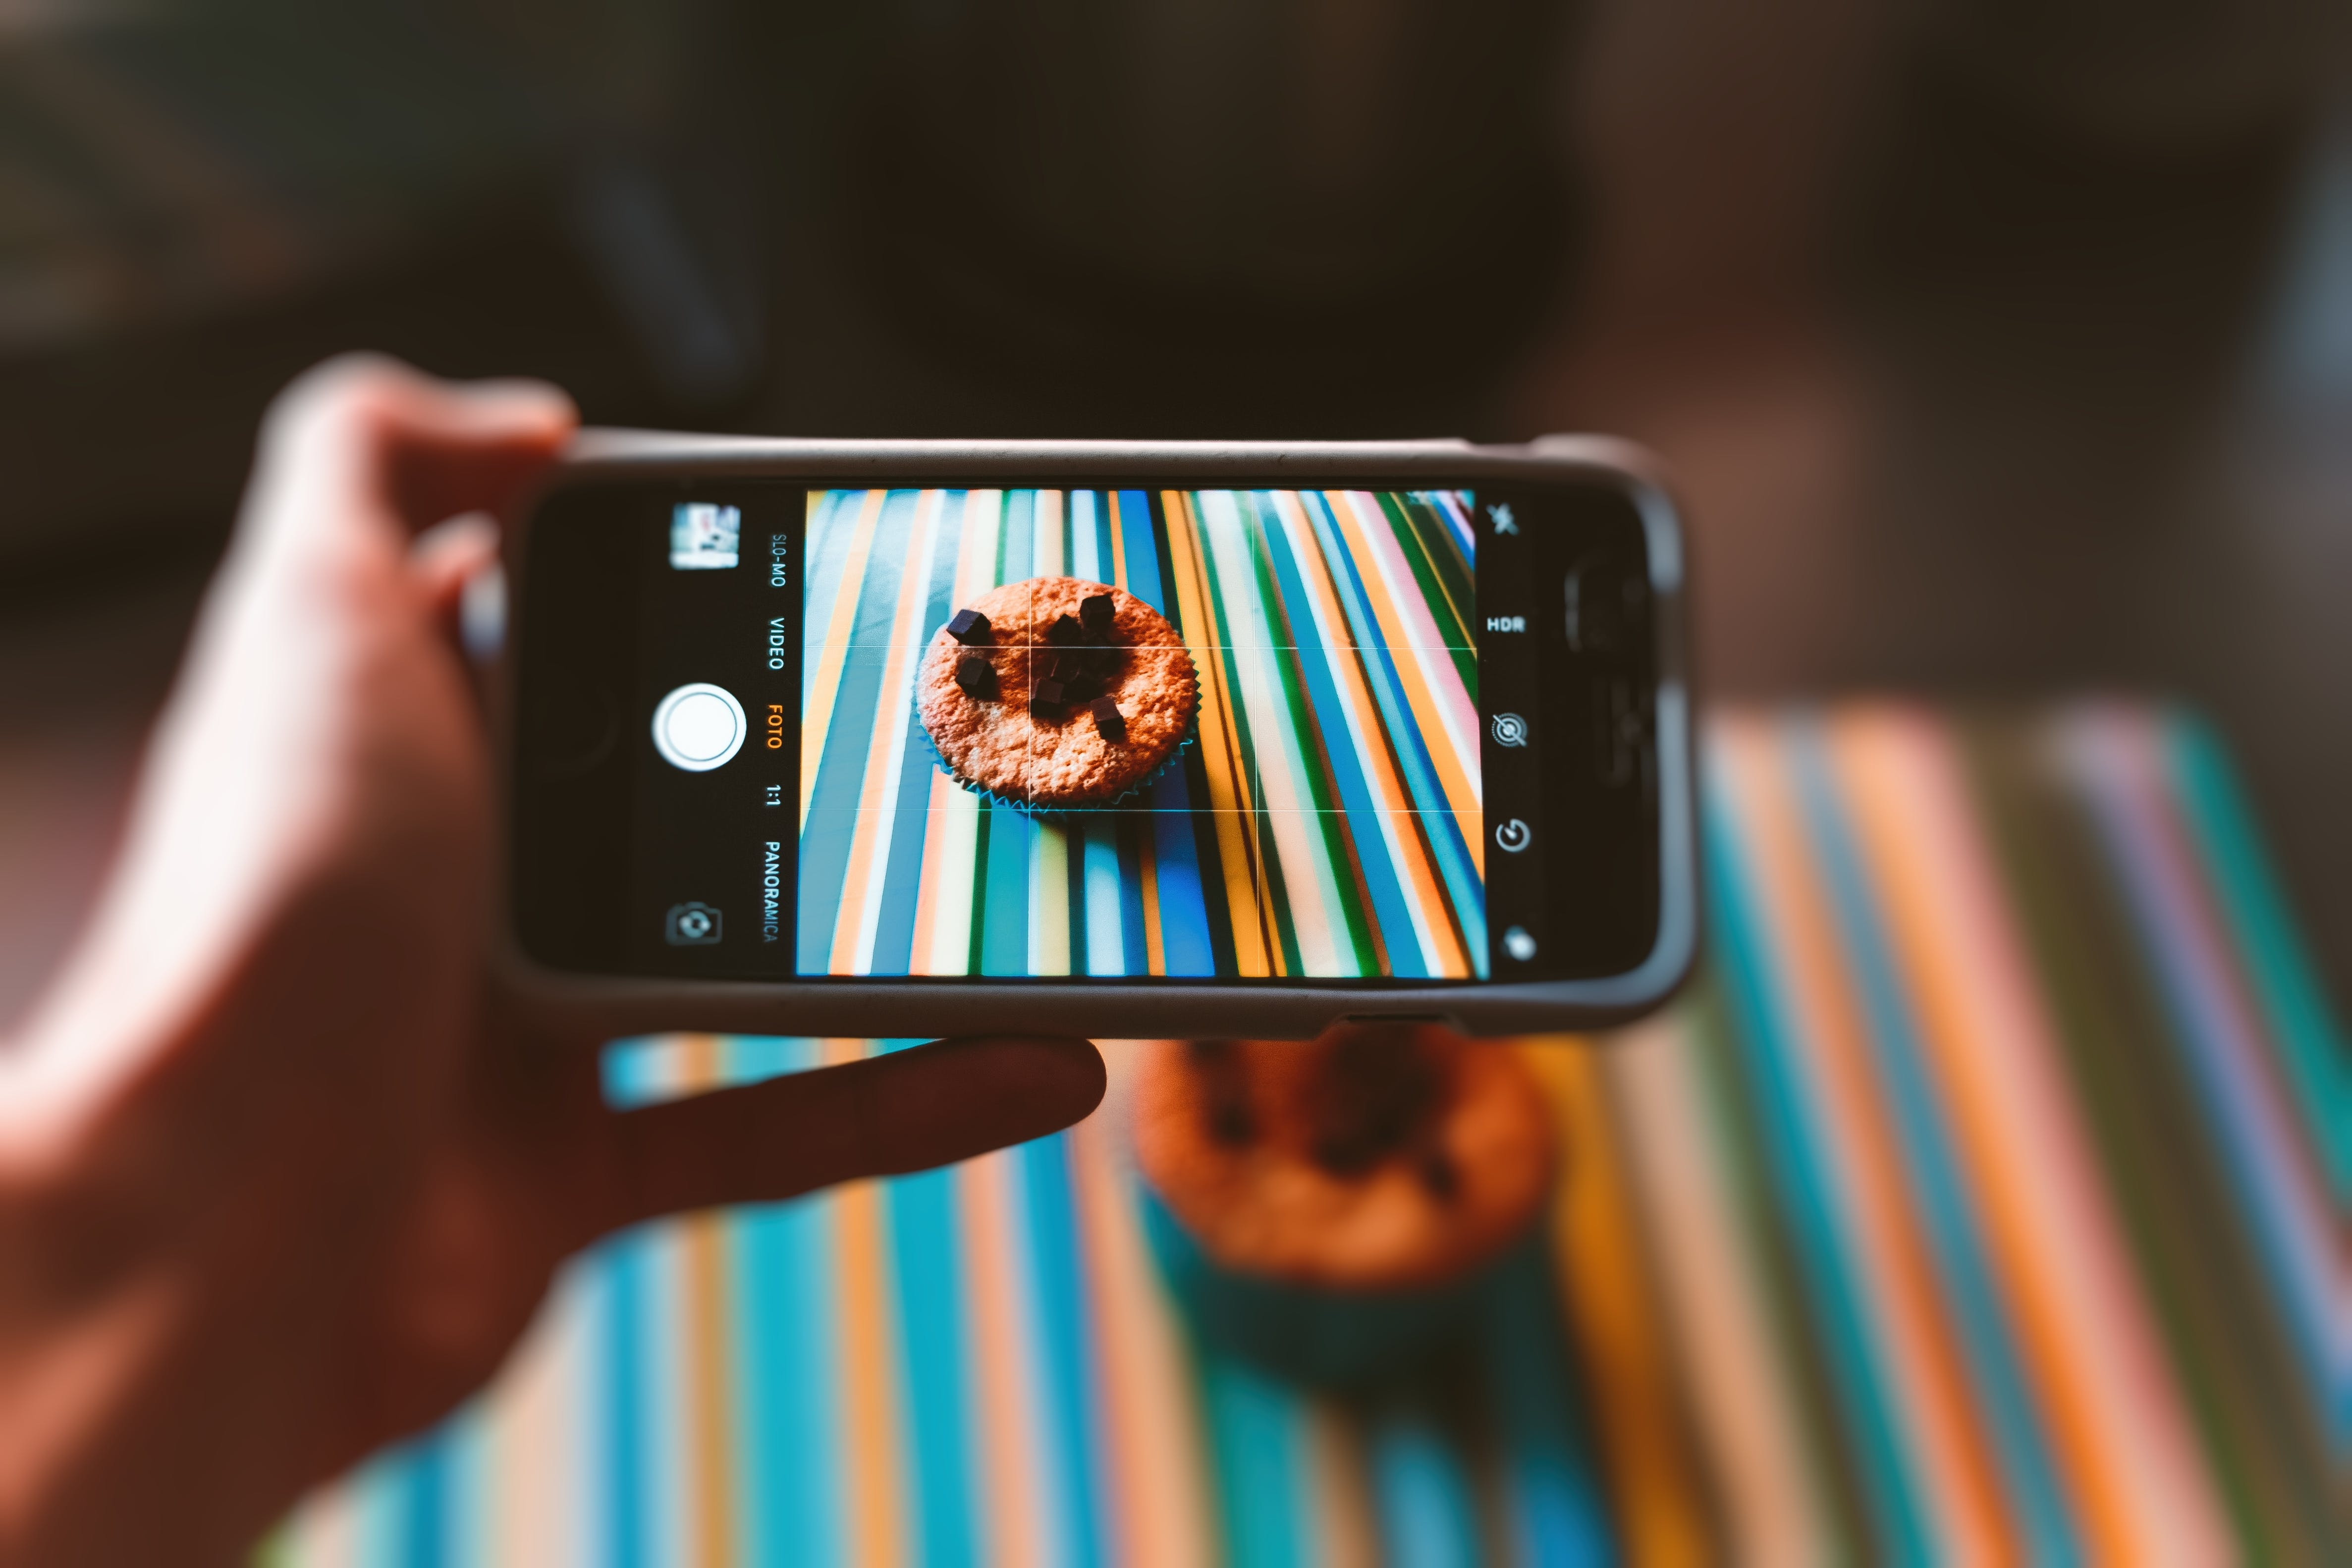 Gratis lagerfoto af berøringsskærm, bærbar, chokoladecupcakes, close-up